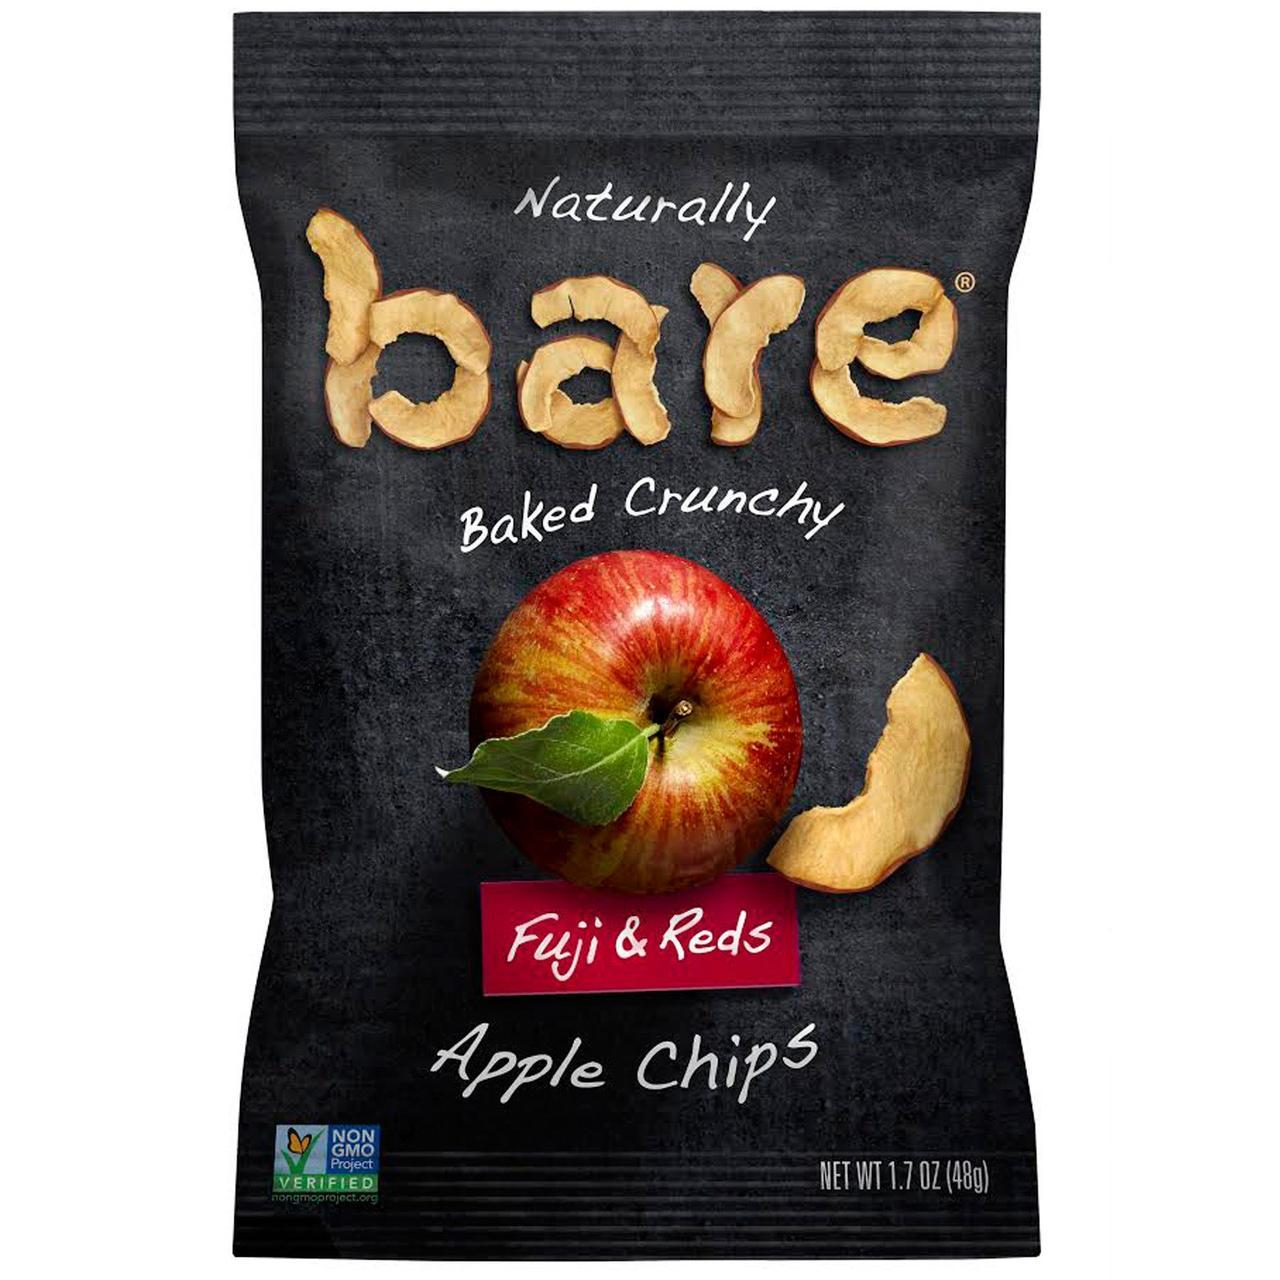 Bare Fruit, Naturally Baked Crunchy, Apple Chips, Fuji & Reds , 1.7 oz (48 g)